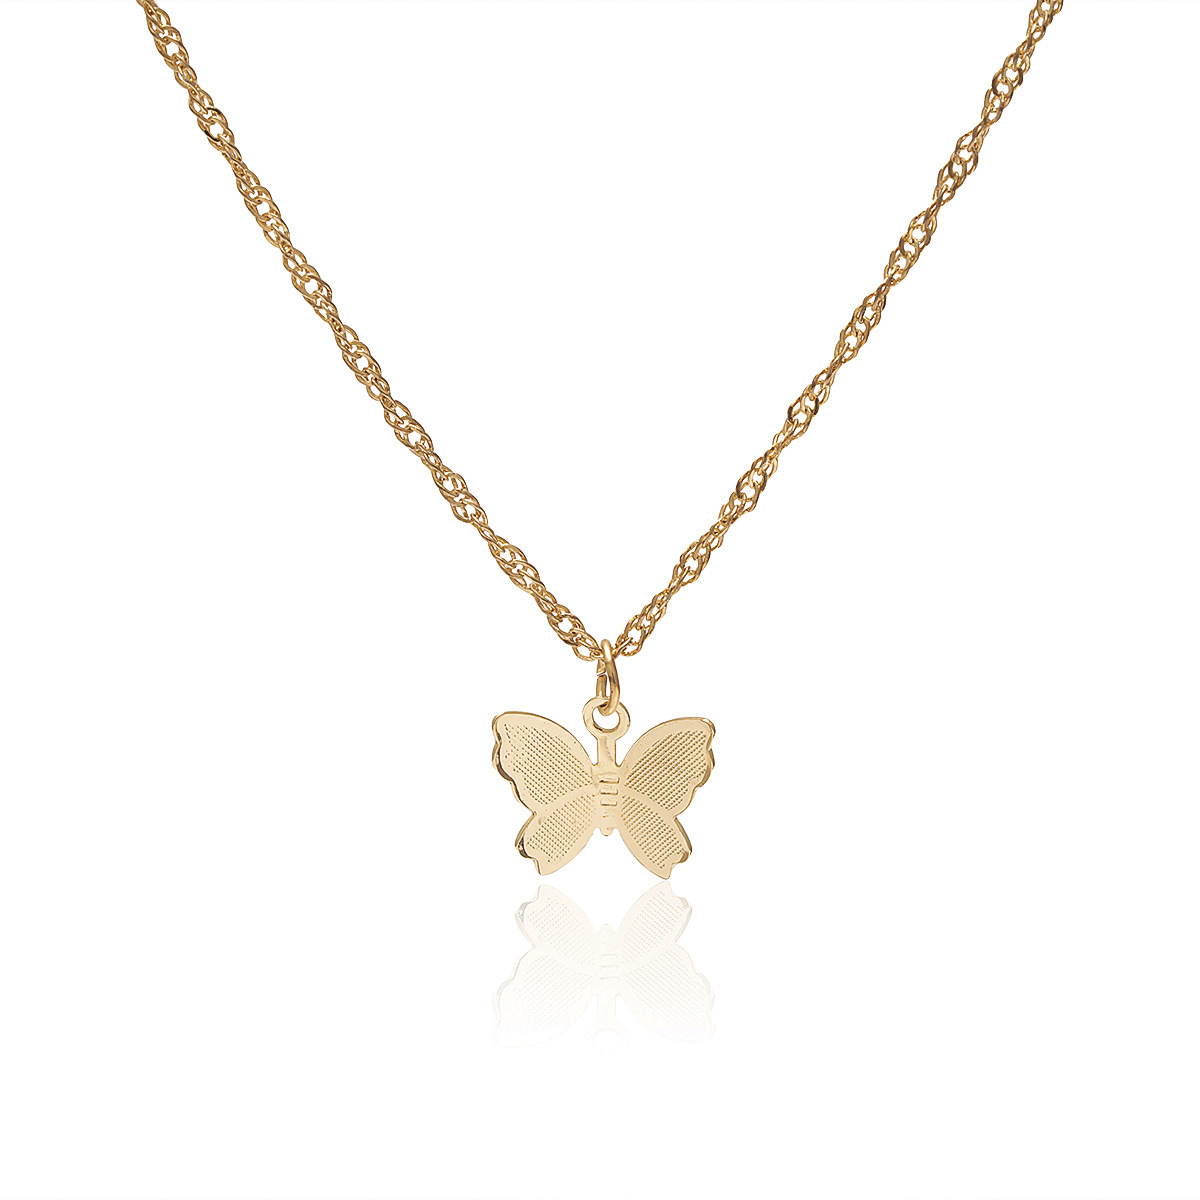 Trendy Butterfly Necklace Women Cool Geometric Tassels Pendant Elegant Single Layer Choker Butterfly Necklace Jewelry For Girls